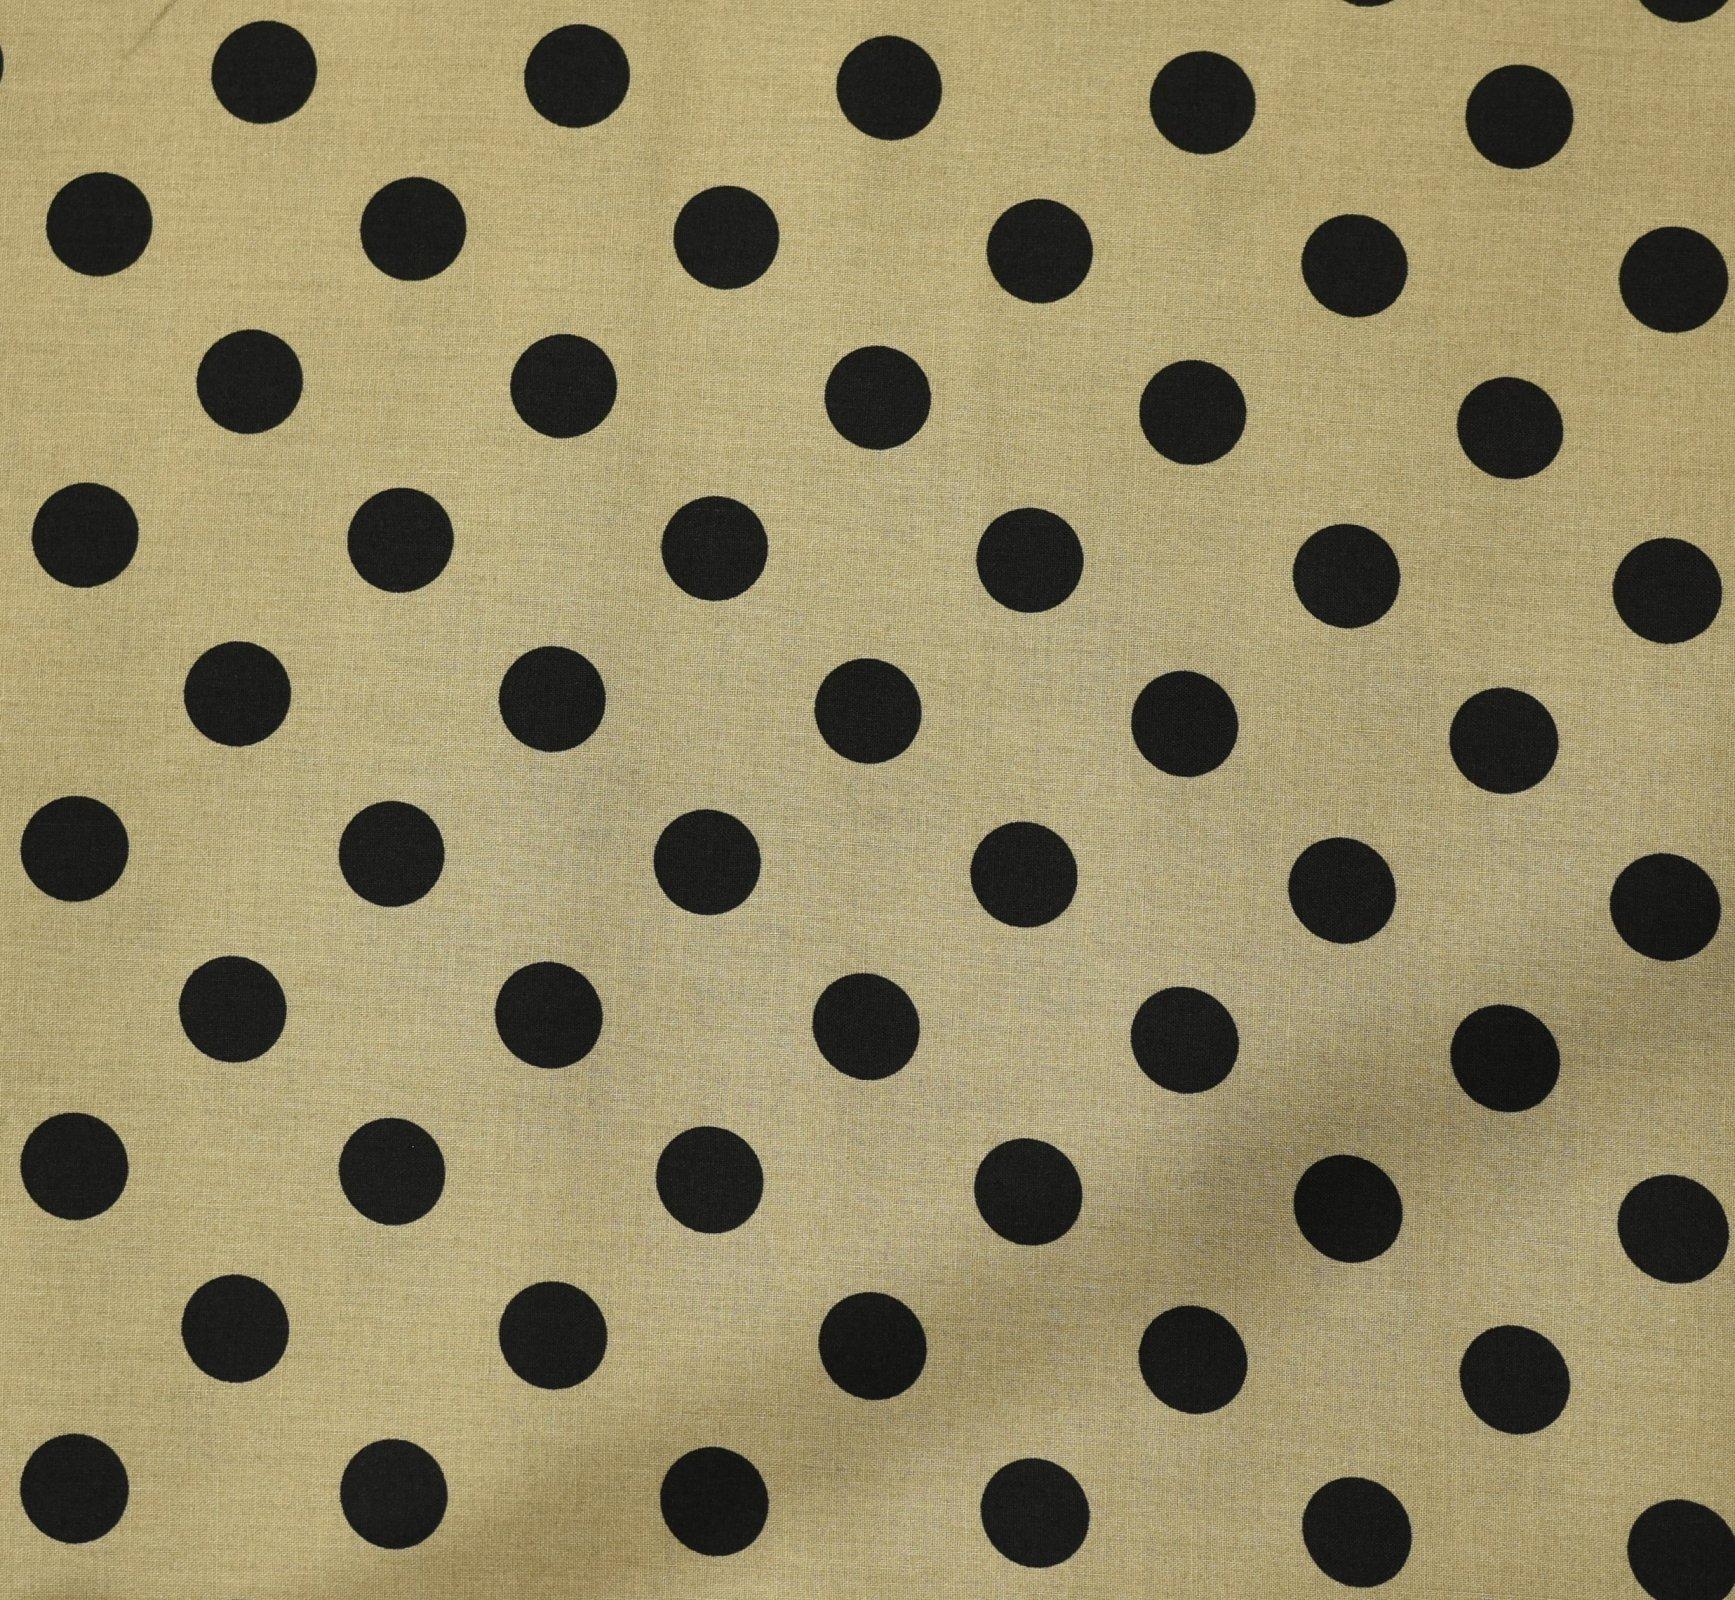 Japanese Fabric - Color Cocktails - Spots - Beige/Black